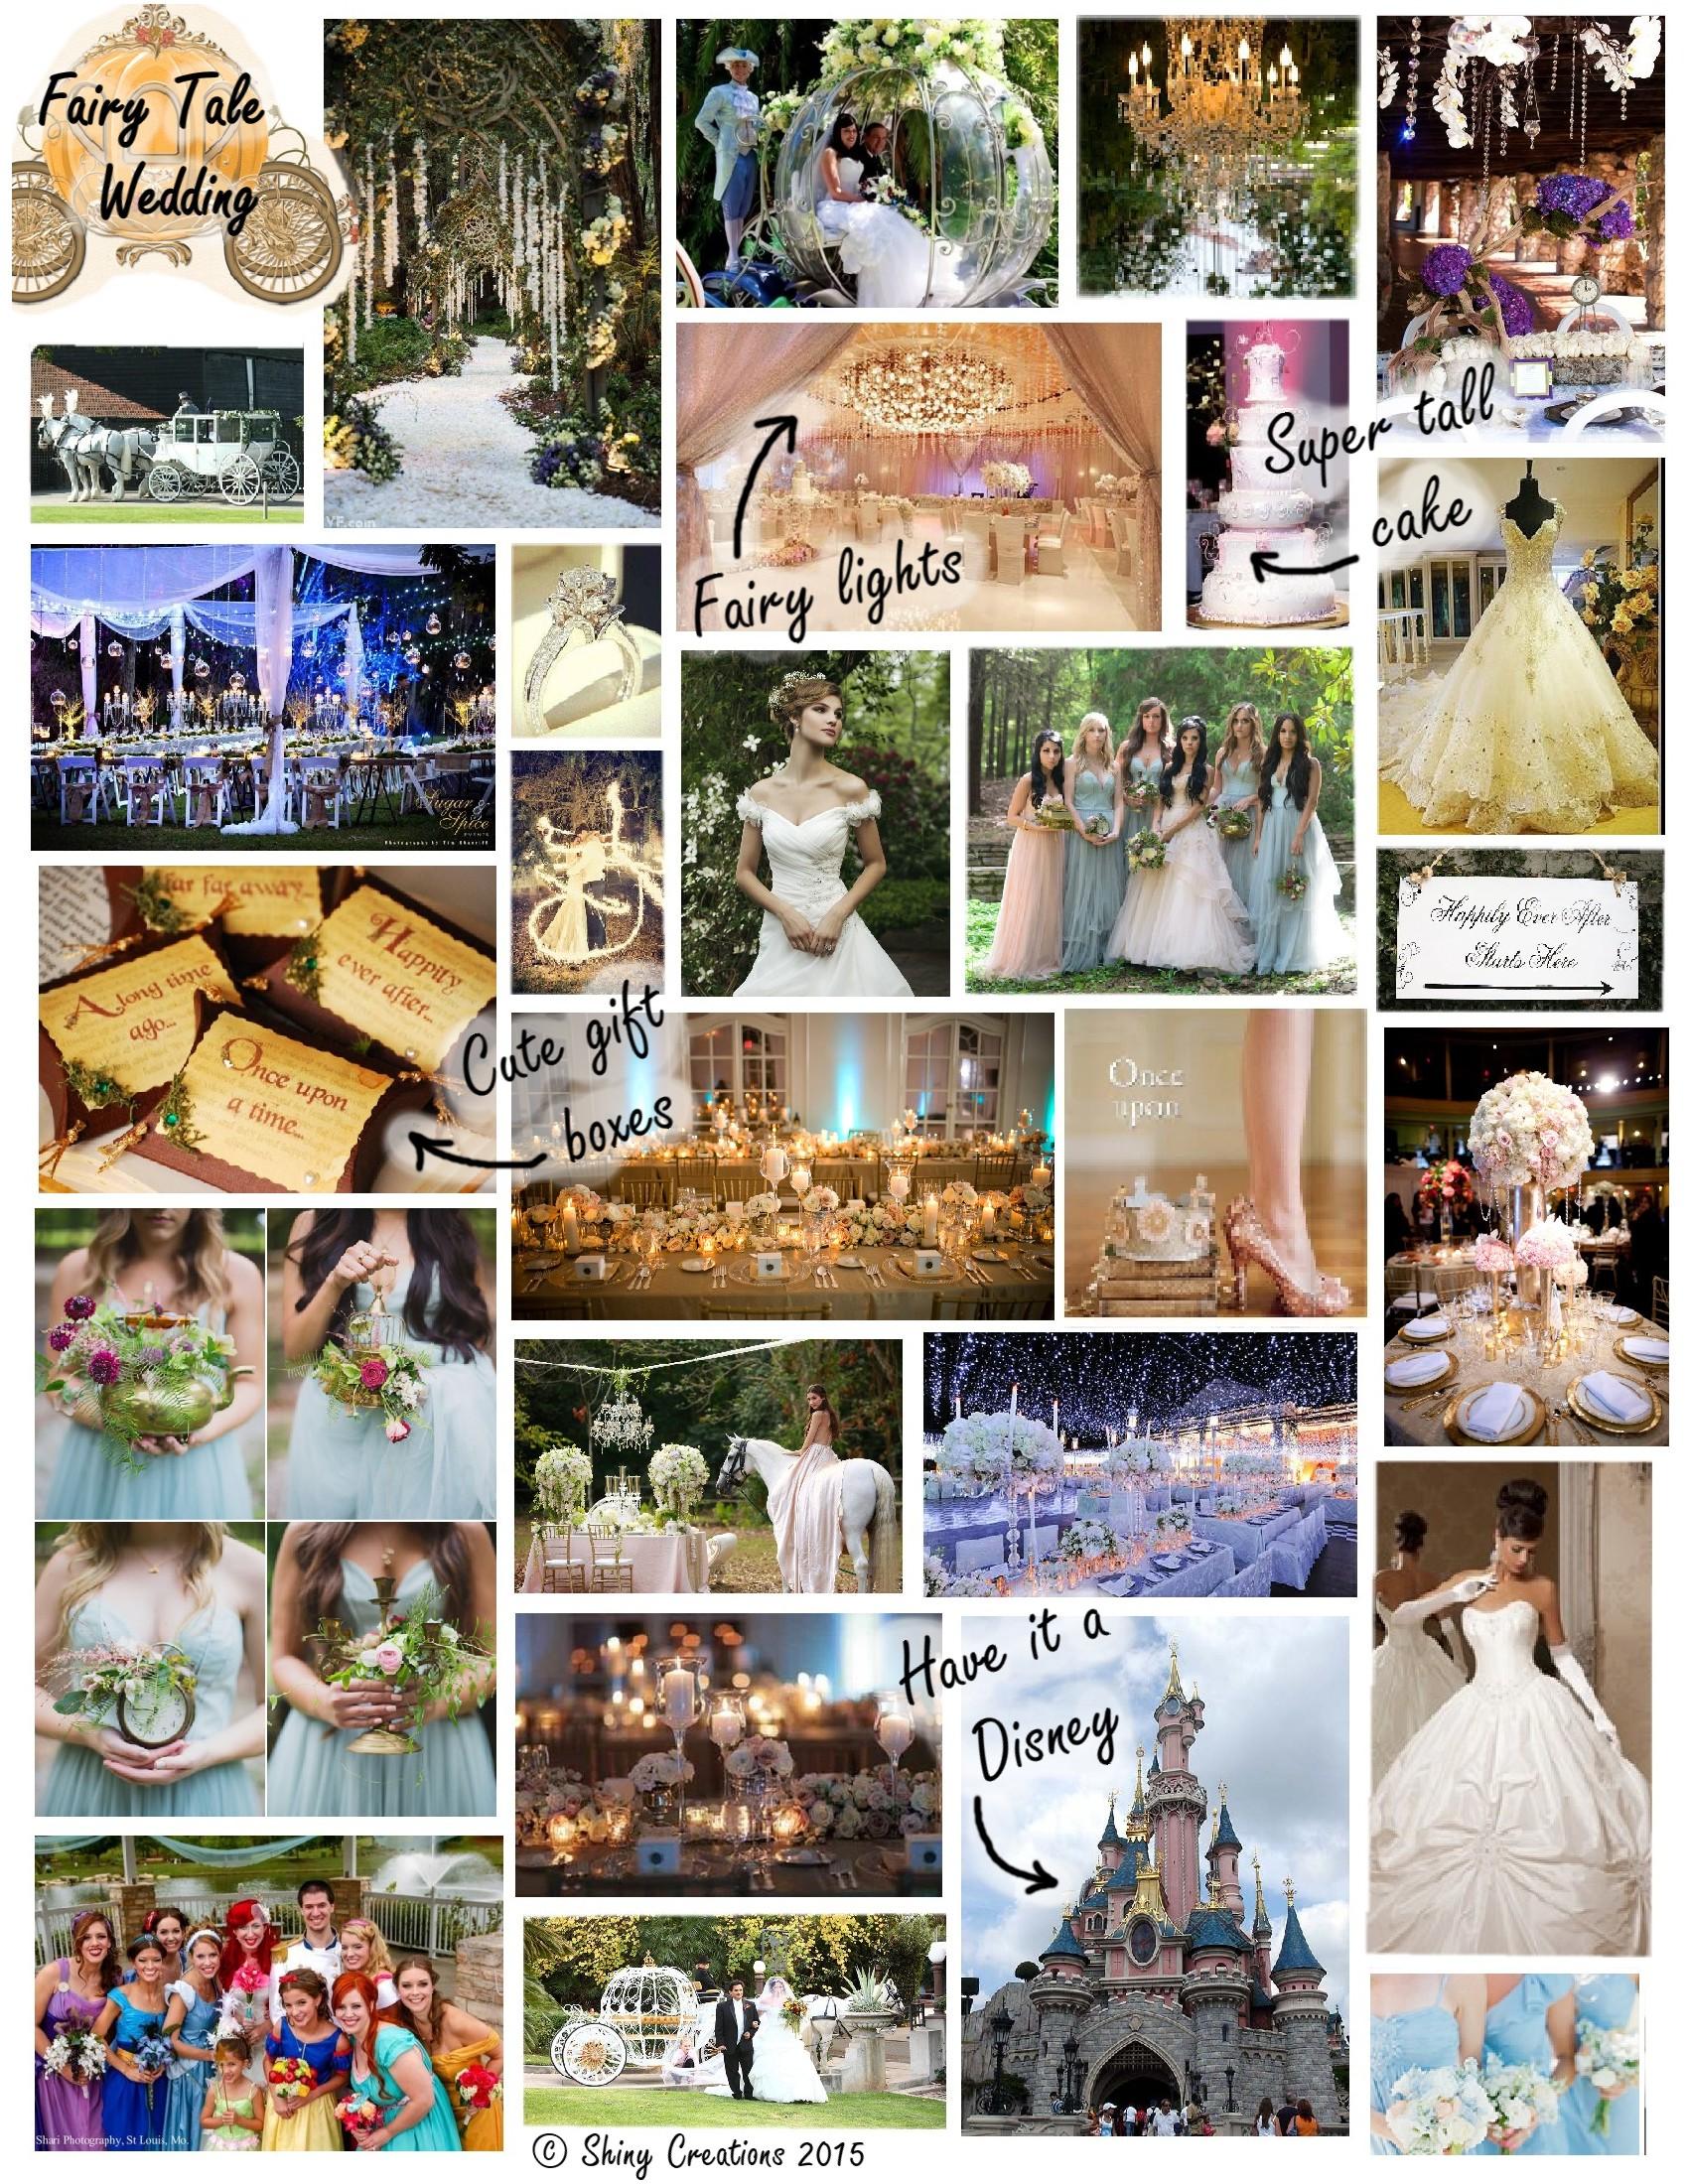 Fairytale wedding board